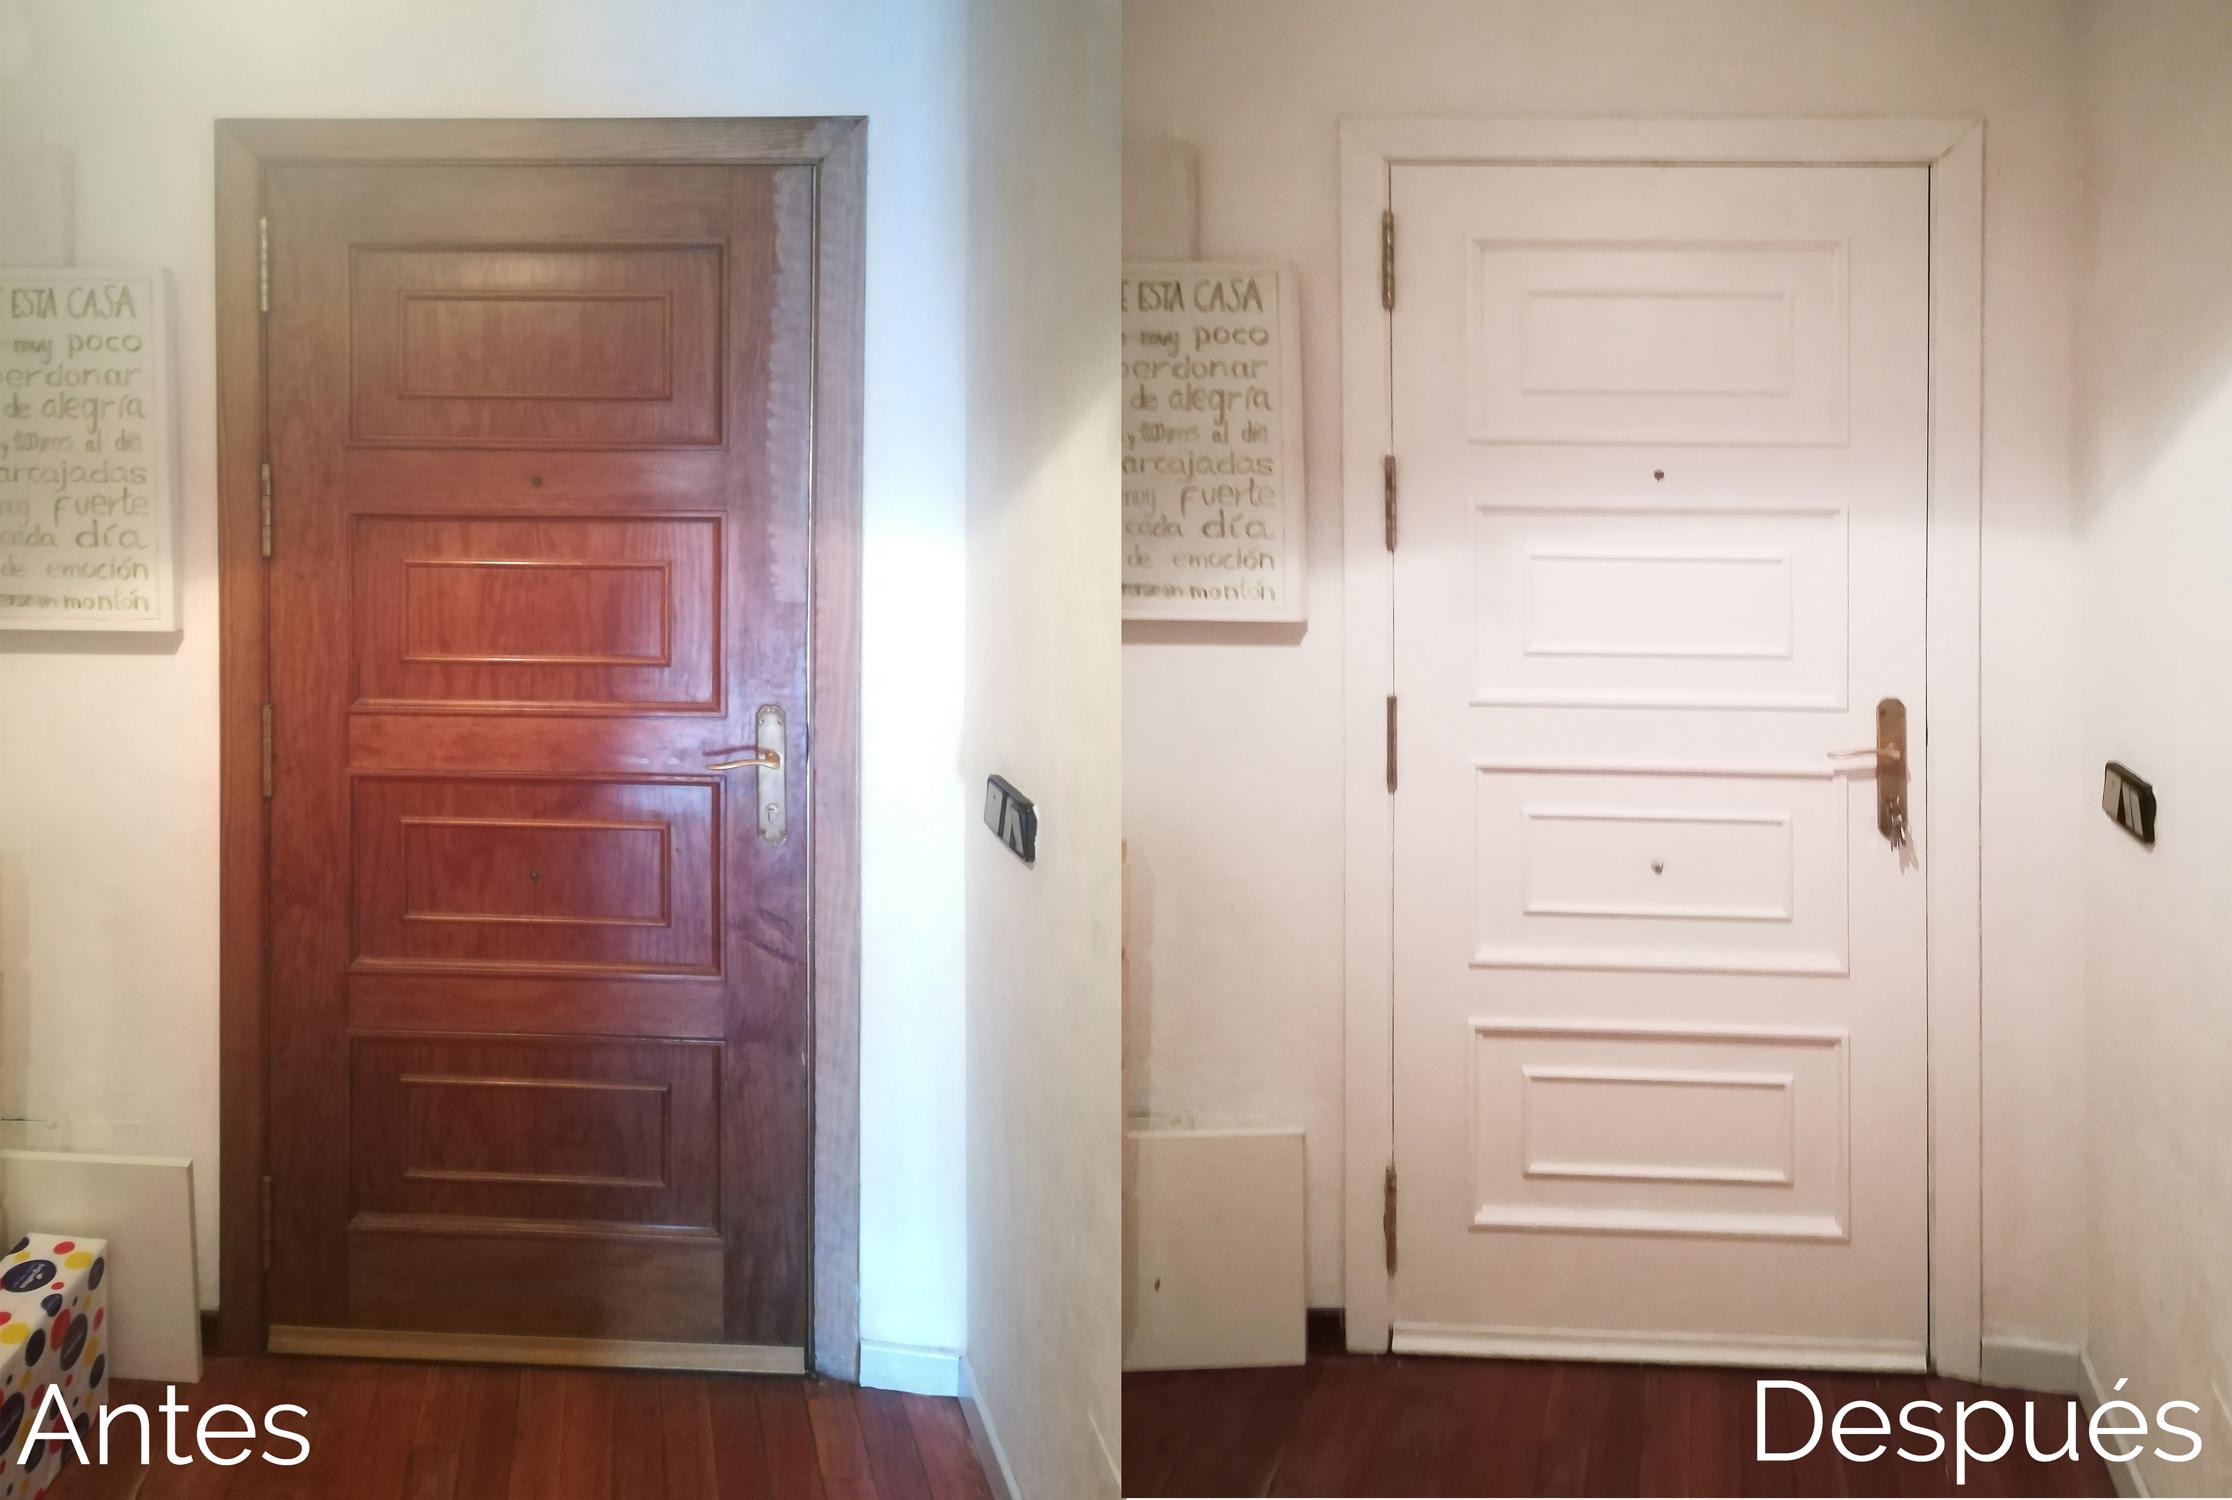 pintar una puerta acrílico o chalk paint